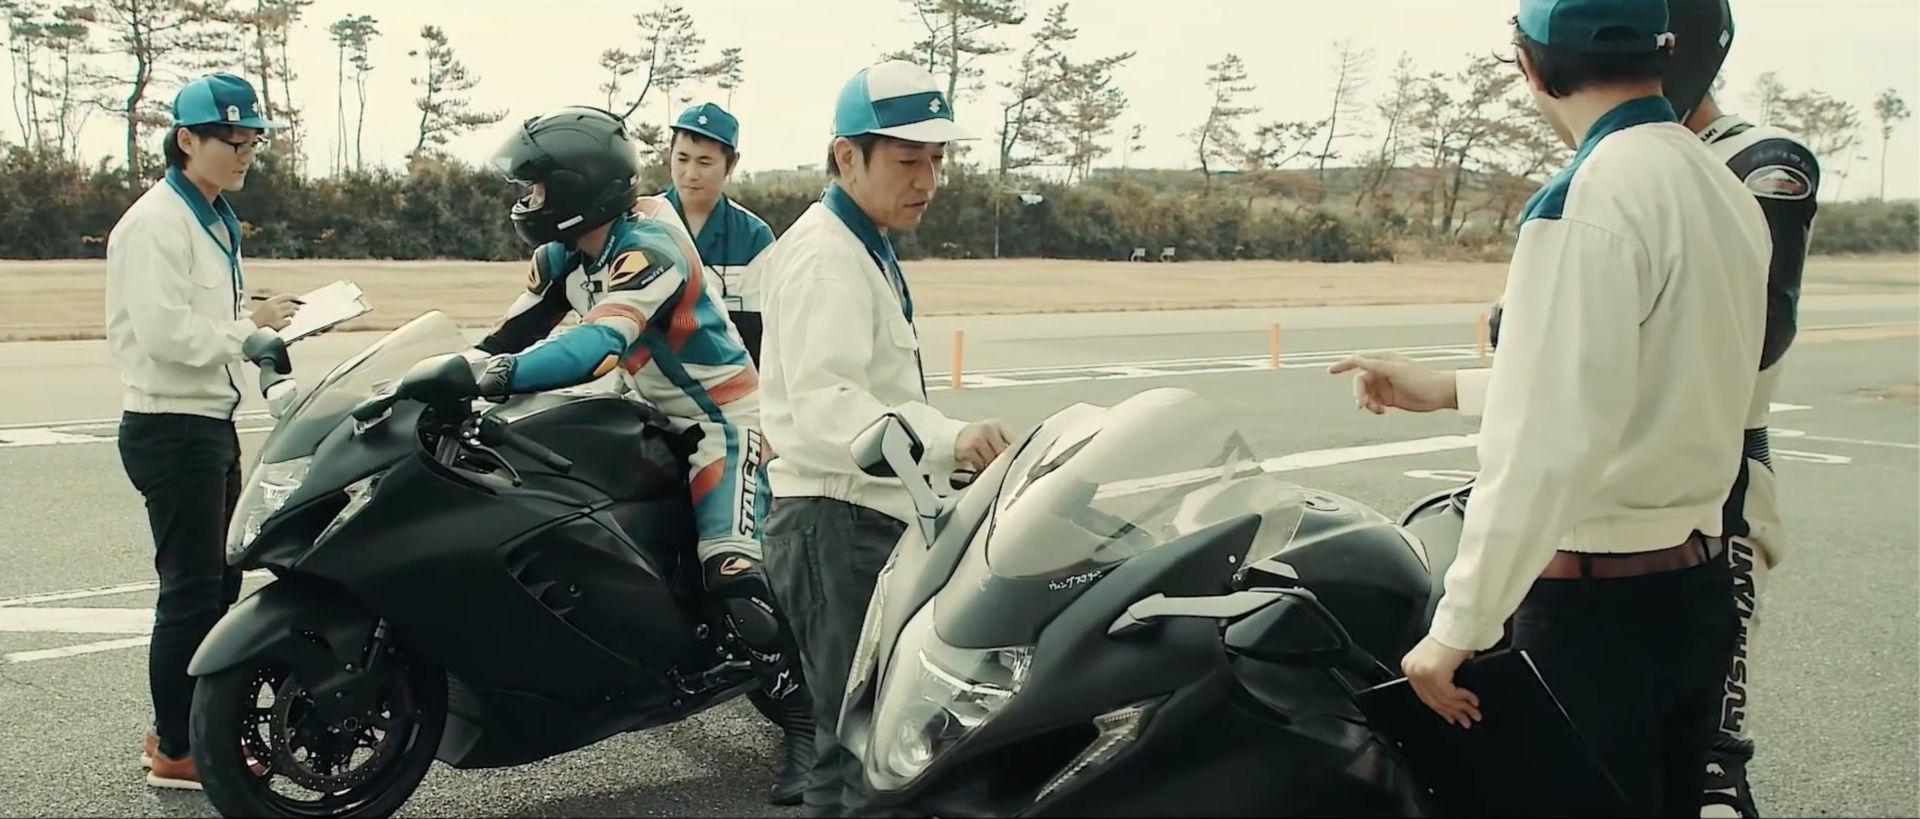 Suzuki engineers and test riders working on the all-new 2022 Hayabusa. Photo courtesy Suzuki Motor of America, Inc.